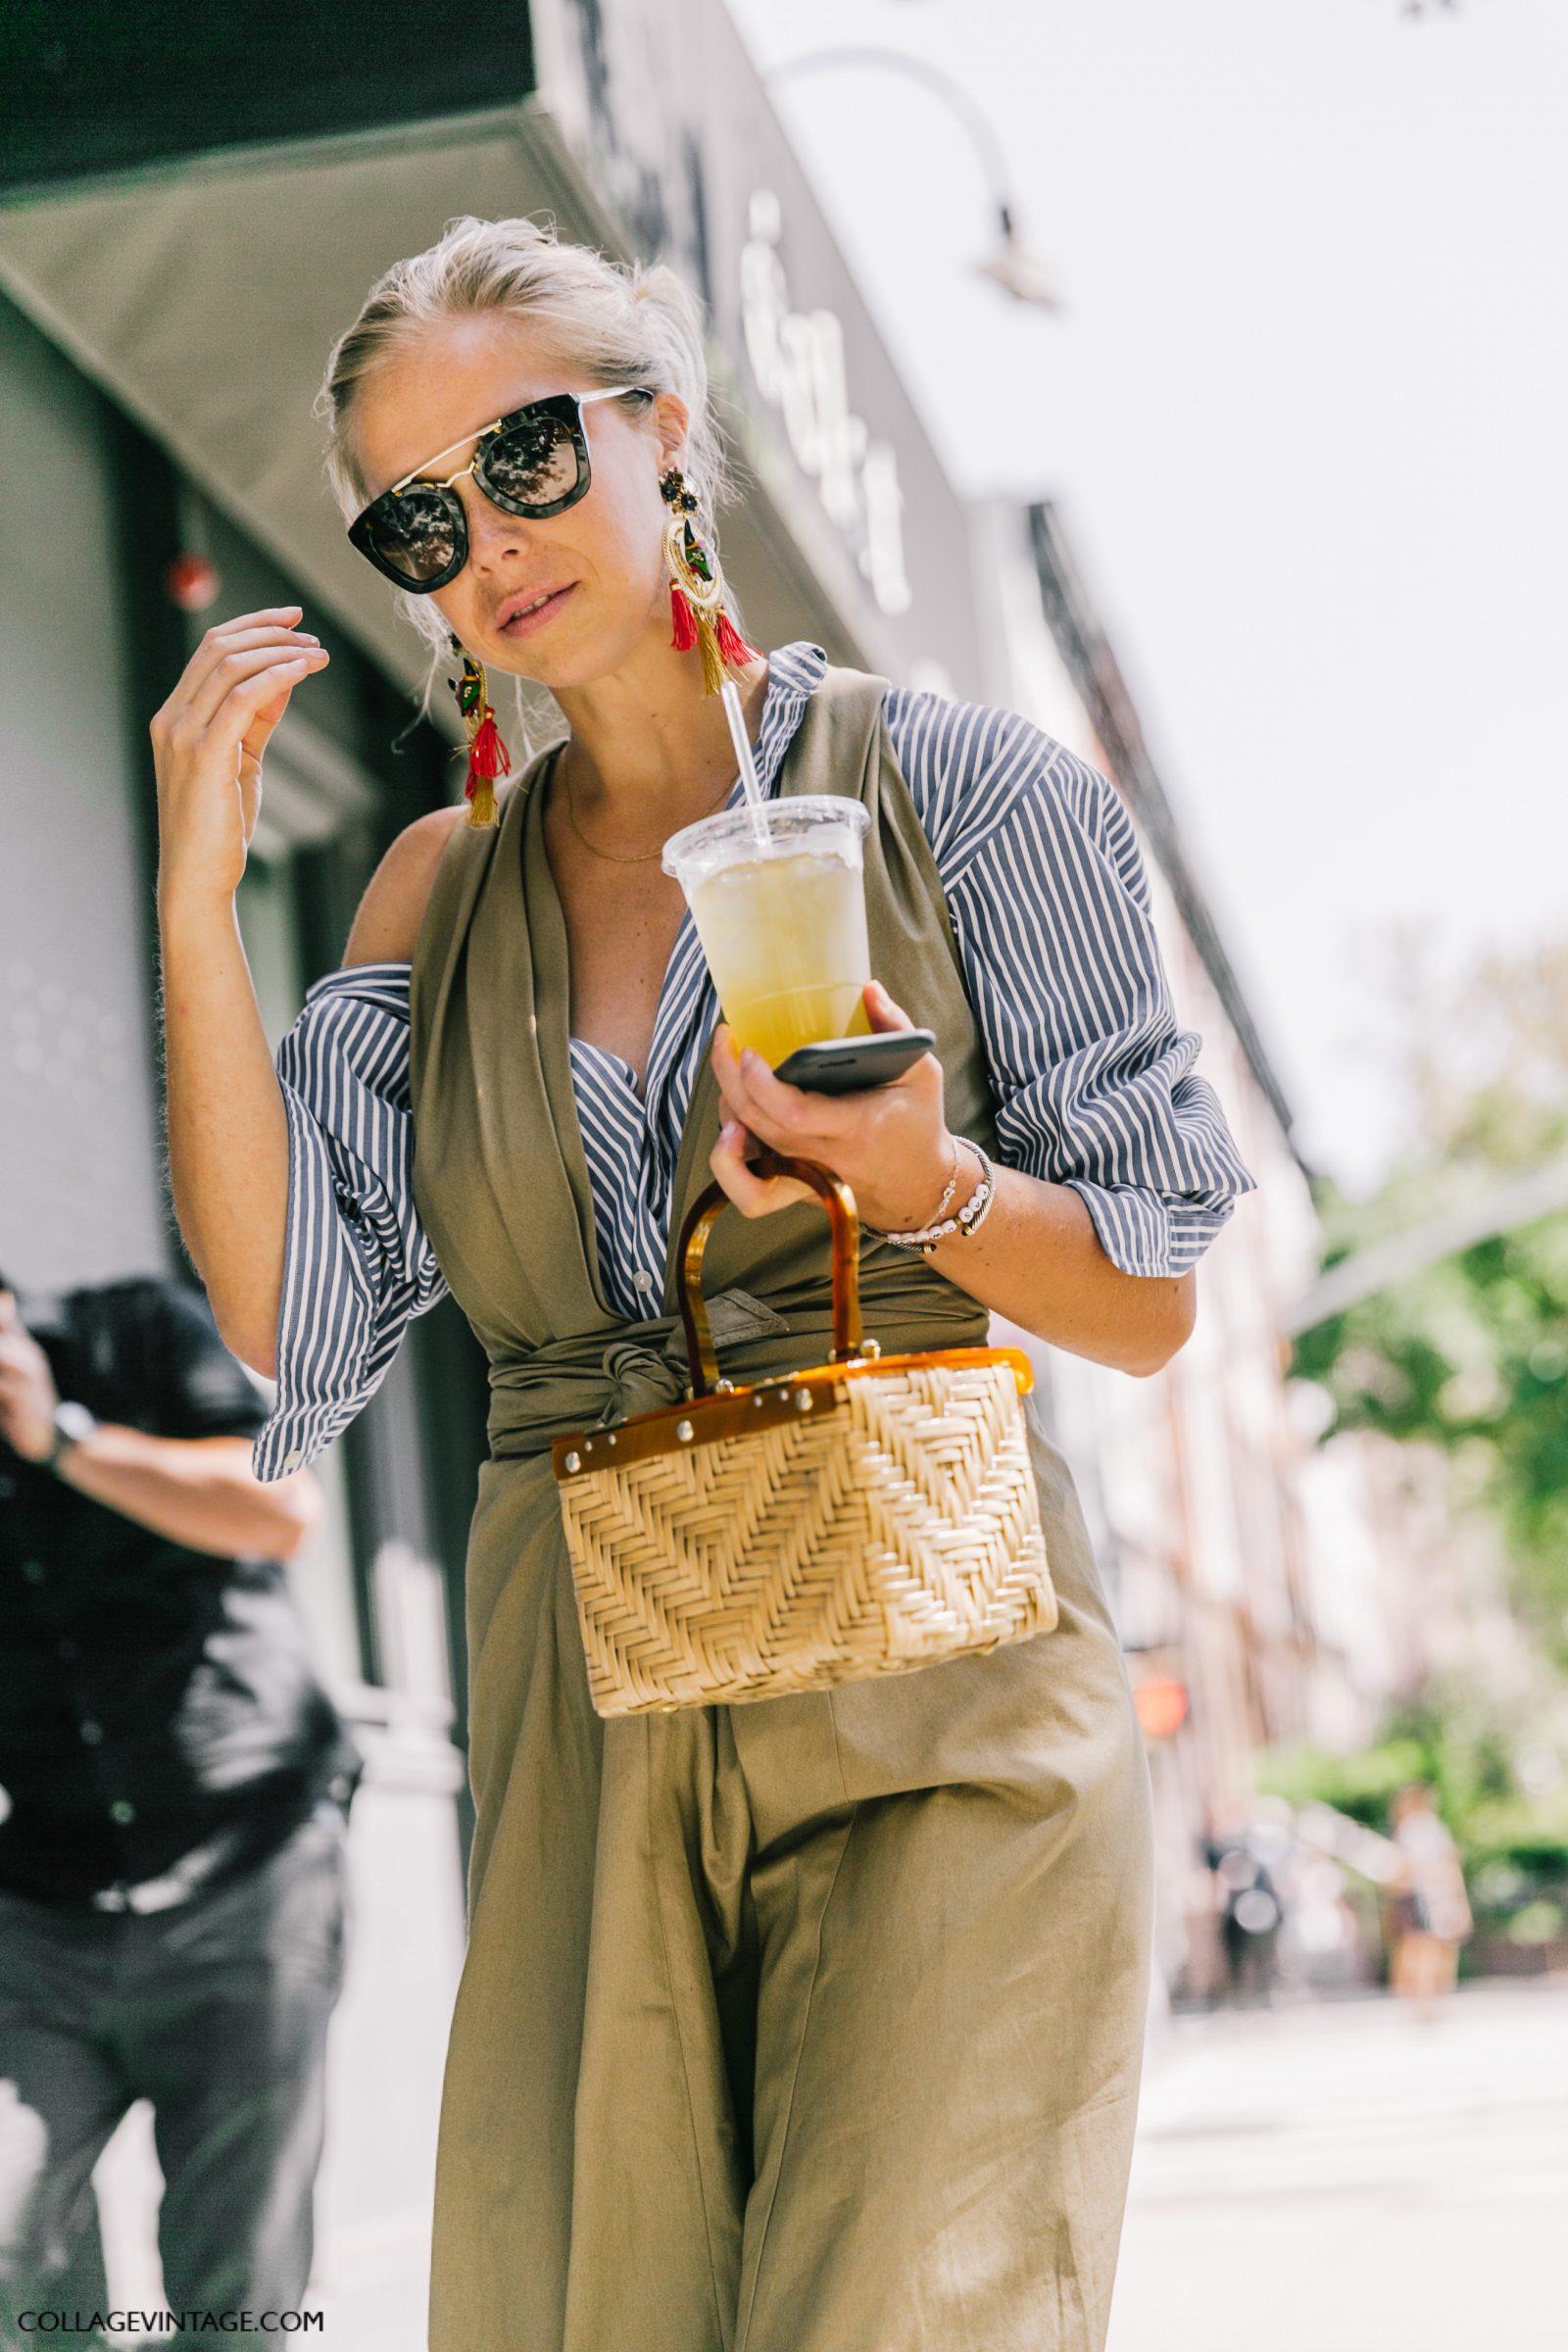 nyfw-new_york_fashion_week_ss17-street_style-outfits-collage_vintage-vintage-mansur_gavriel-rodarte-coach-116